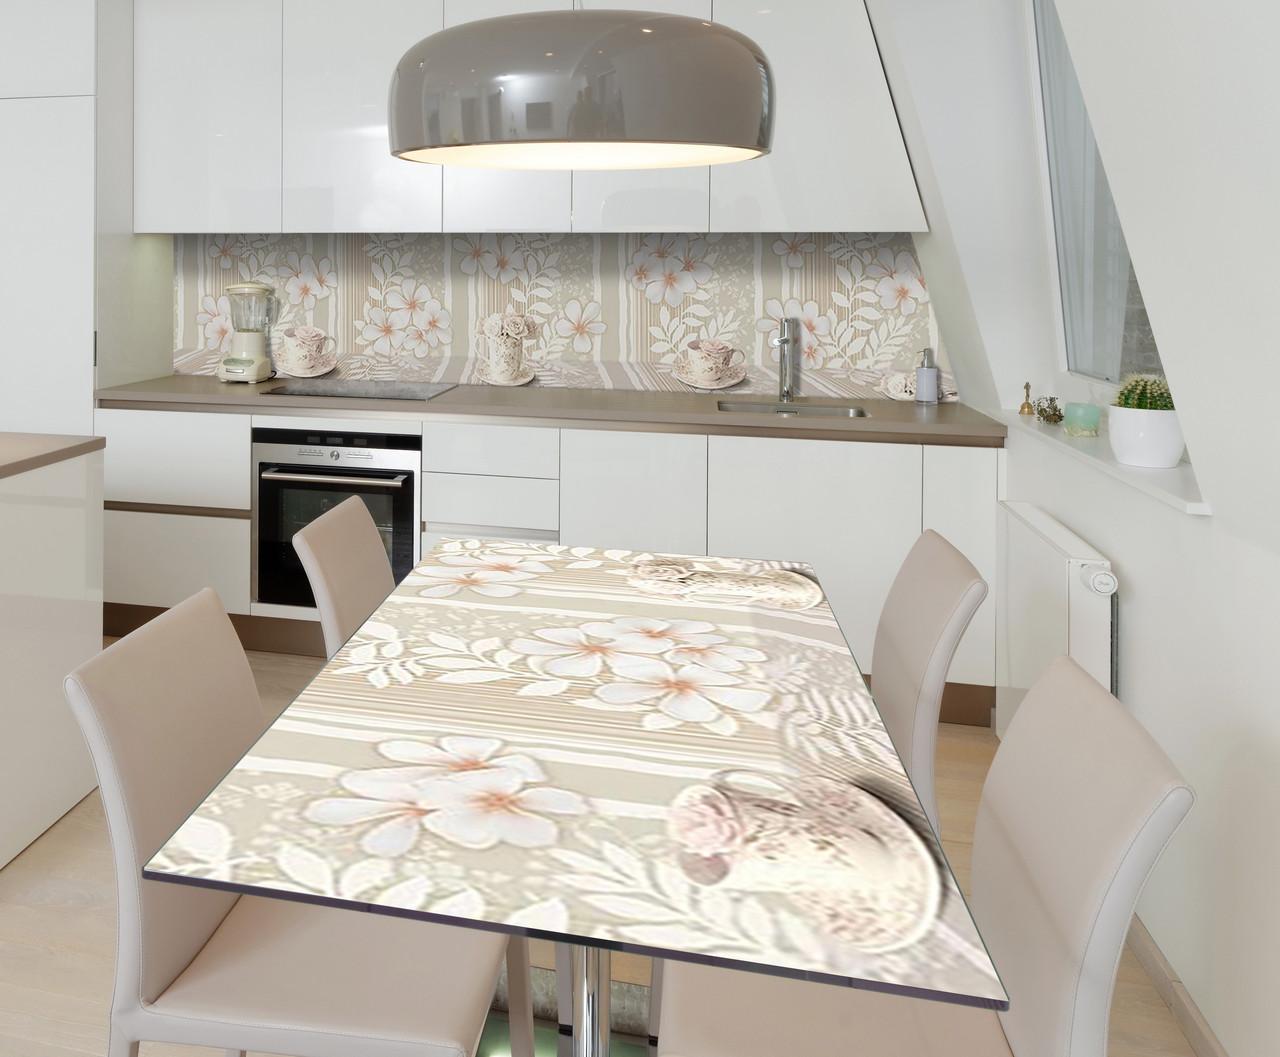 Наклейка 3Д виниловая на стол Zatarga «Ажурное утро» 600х1200 мм для домов, квартир, столов, кофейн, кафе